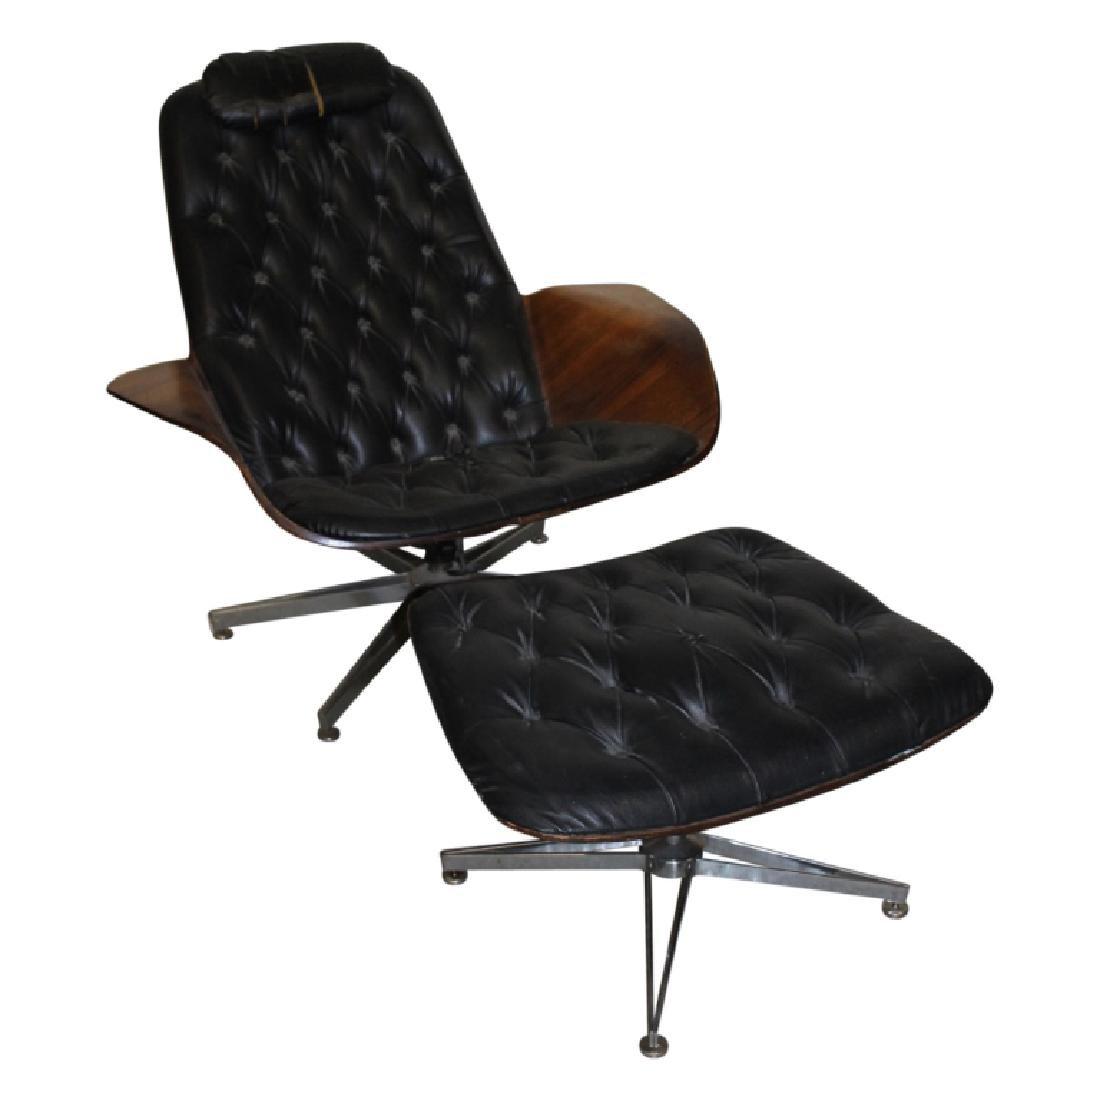 Herman Miller Chair + Ottoman